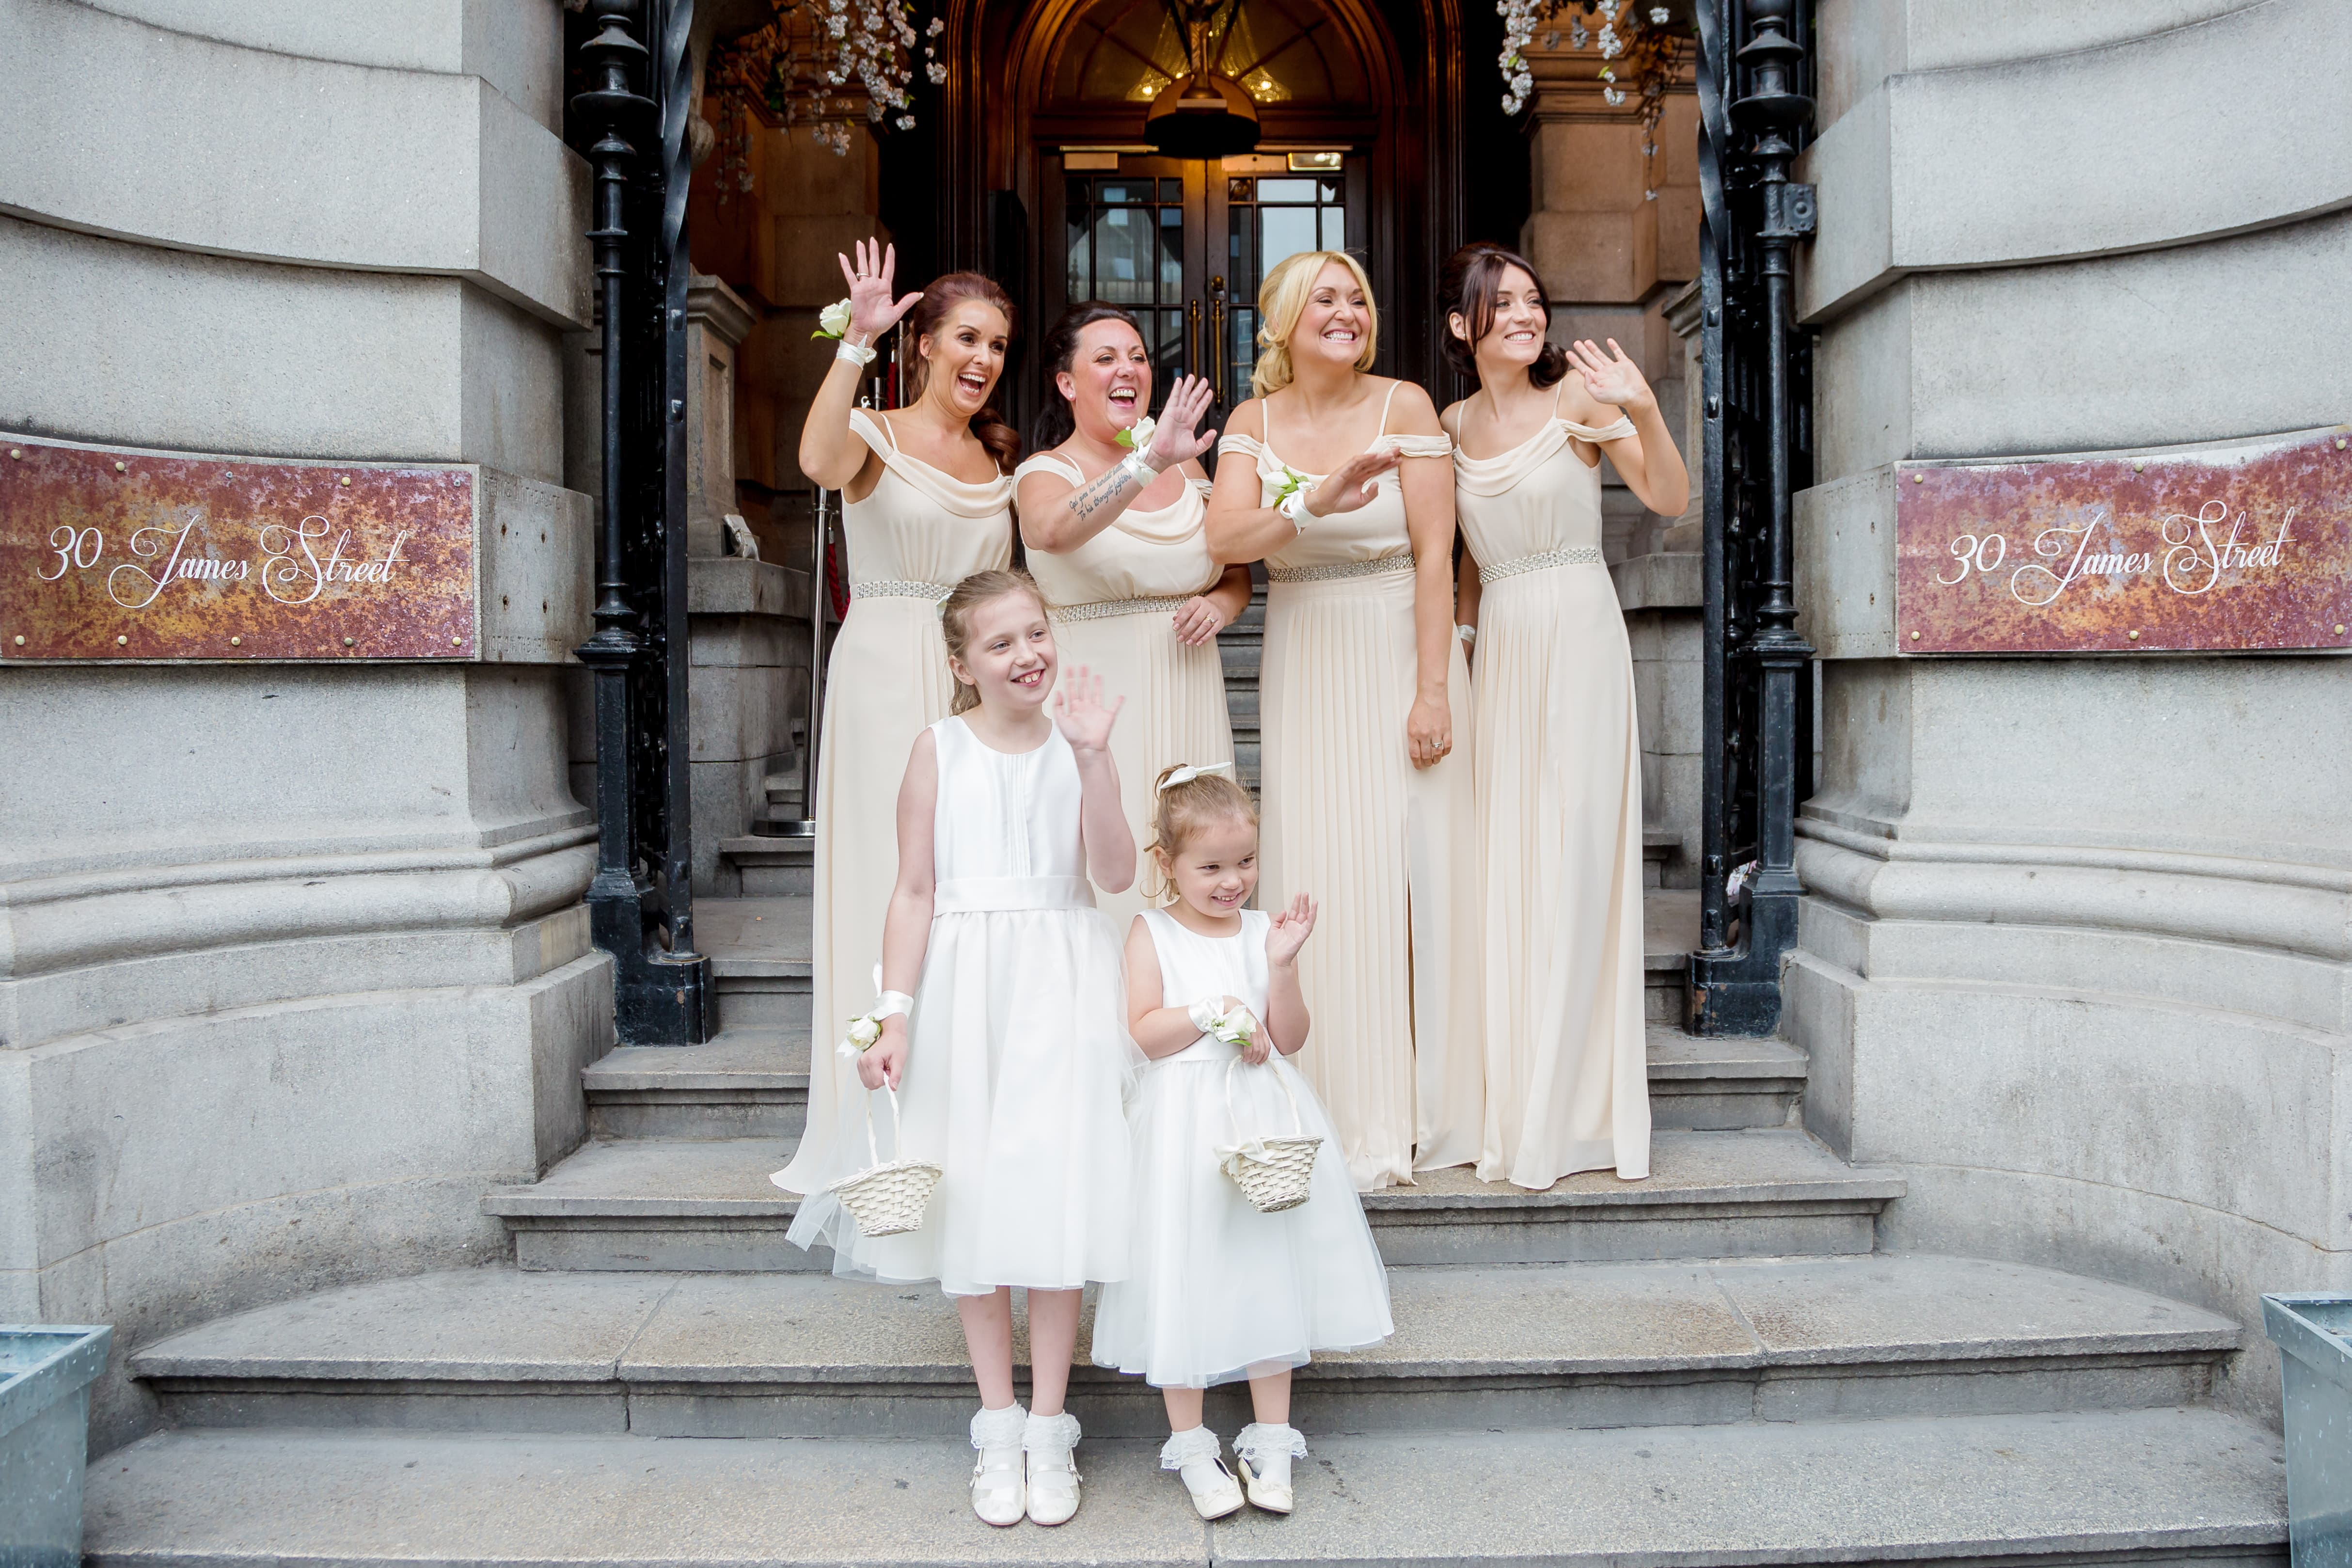 30 James Street Liverpool Bridesmaids